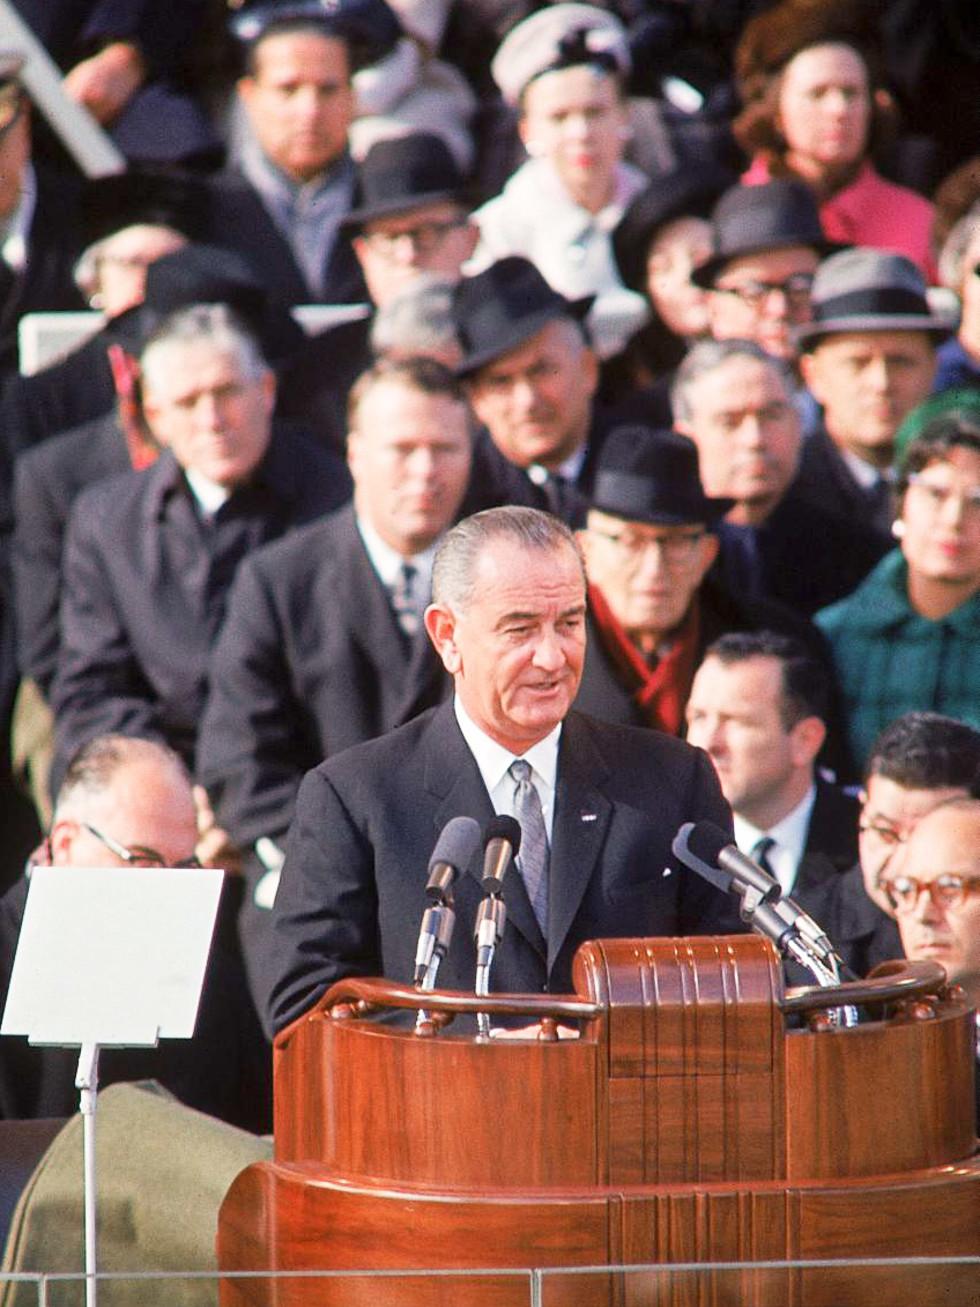 News_Lyndon Baines Johnson_president_speaking_podium